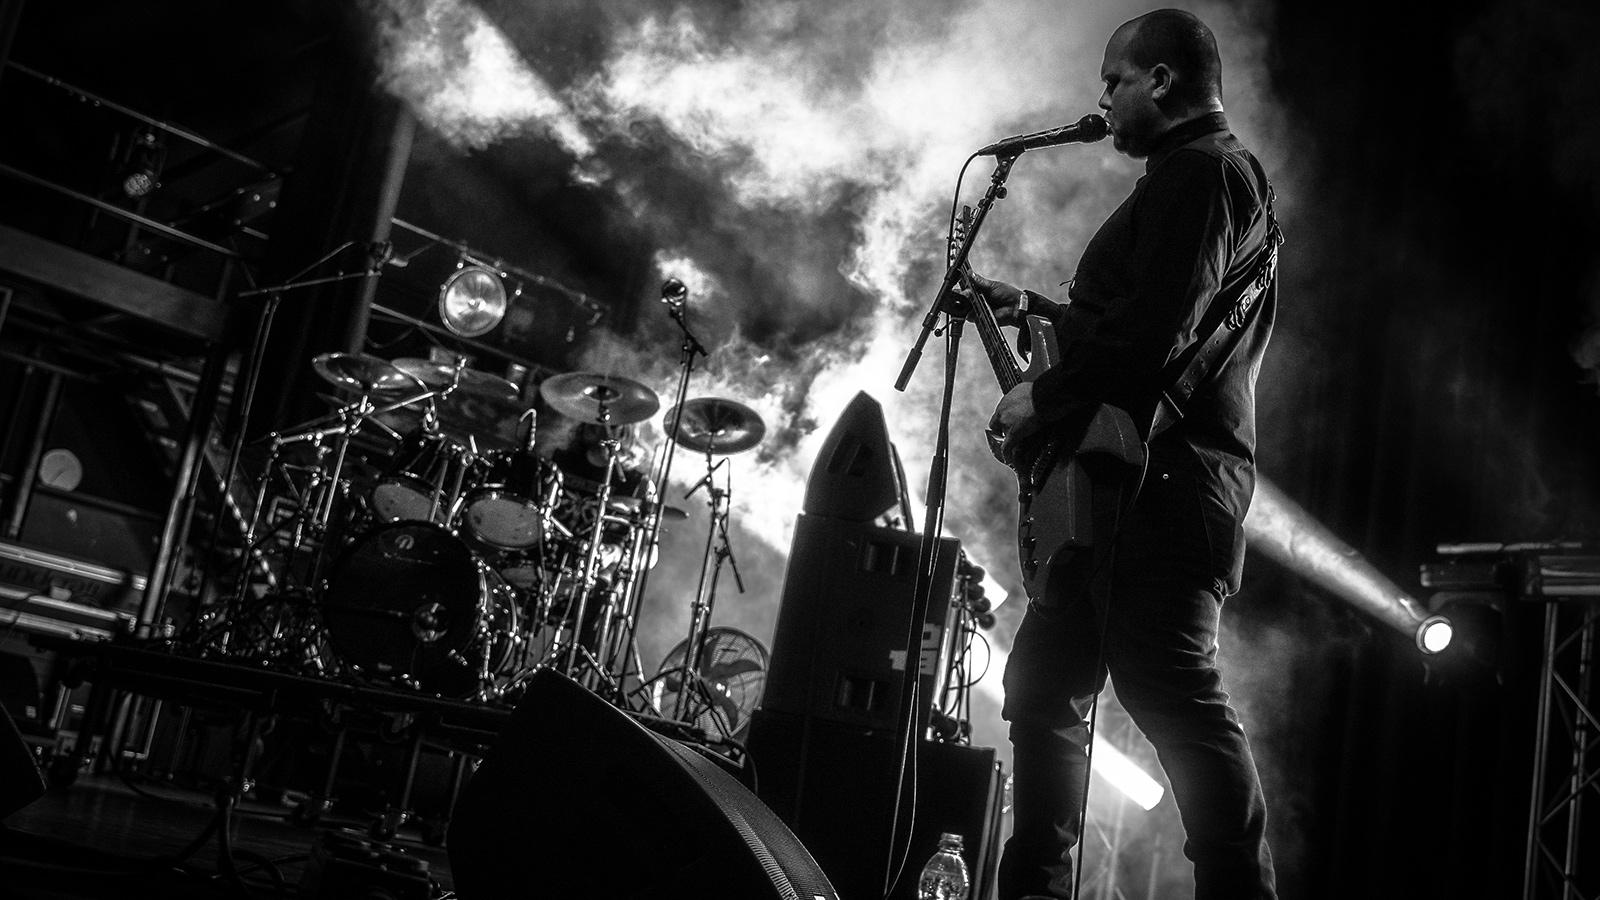 Hear Death-Doom Duo Encoffination Evoke Winter, Rippikoulu on Suffocating New Song